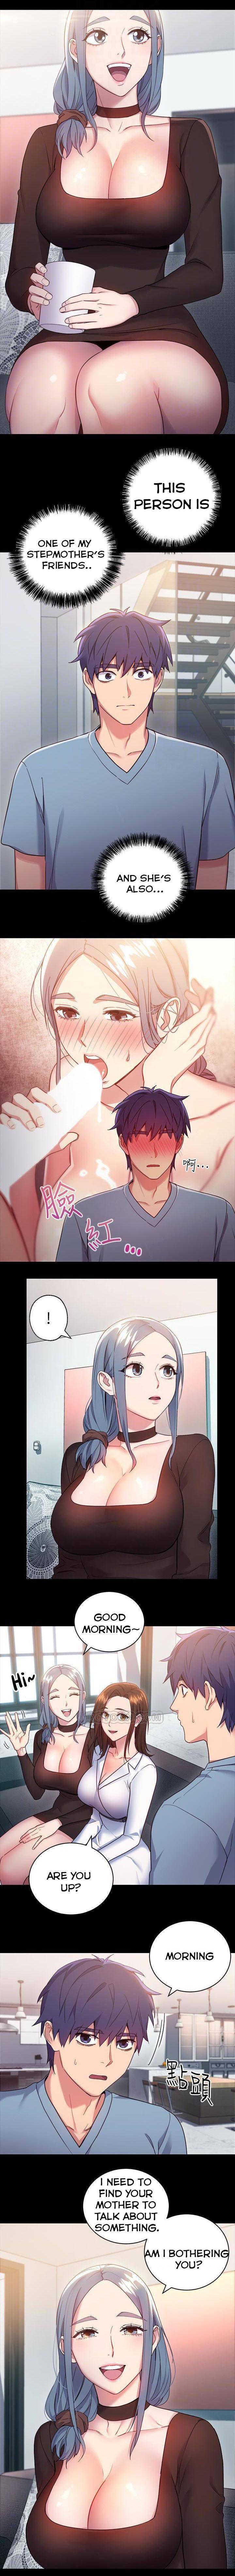 [Neck Pilllow] Stepmother Friends Ch.40/? [English] [Hentai Universe] NEW! 22/10/2020 106